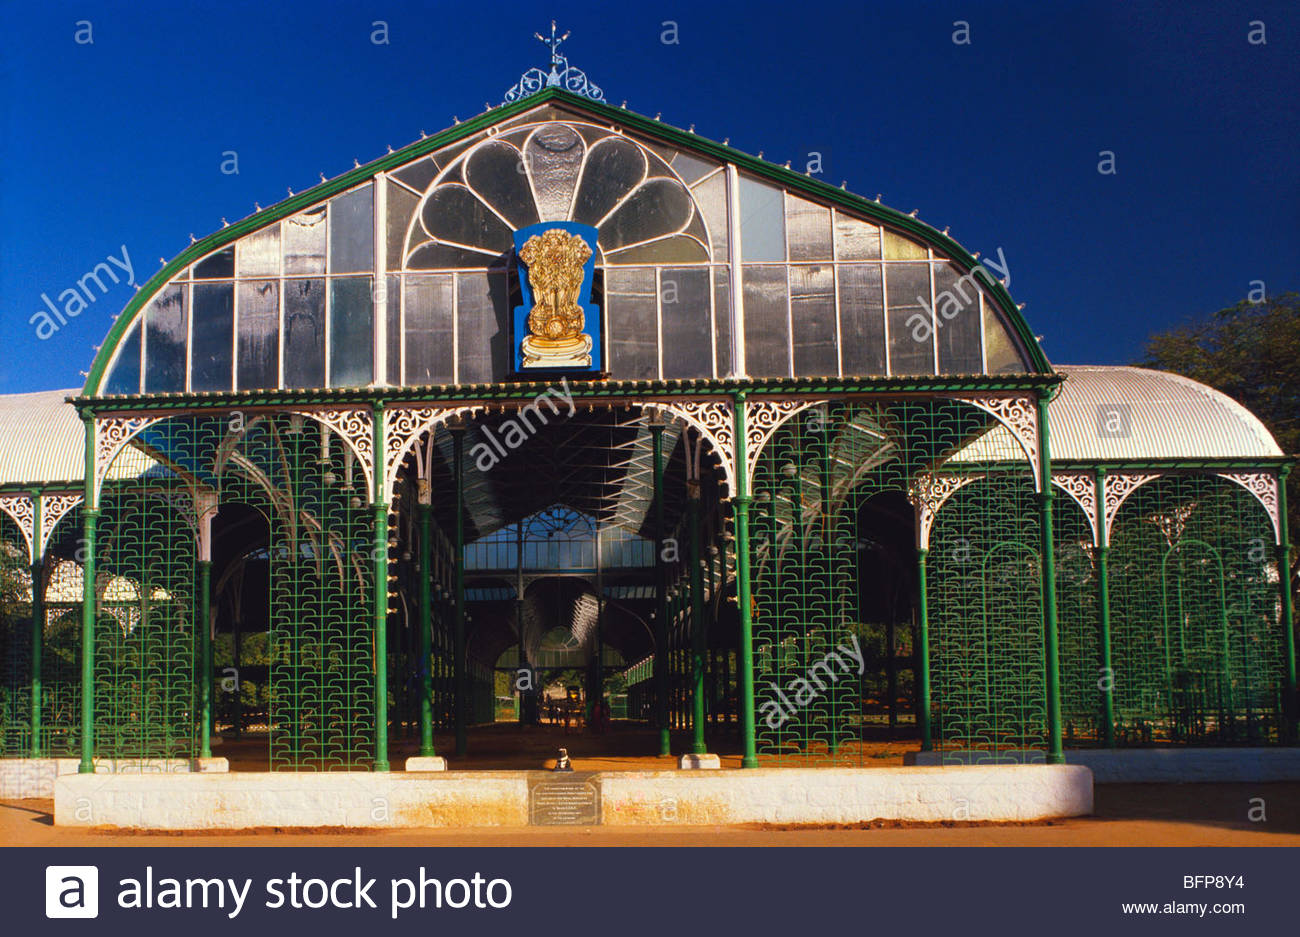 tsm 65012 famous glass pavilion lalbaugh botanical garden stock